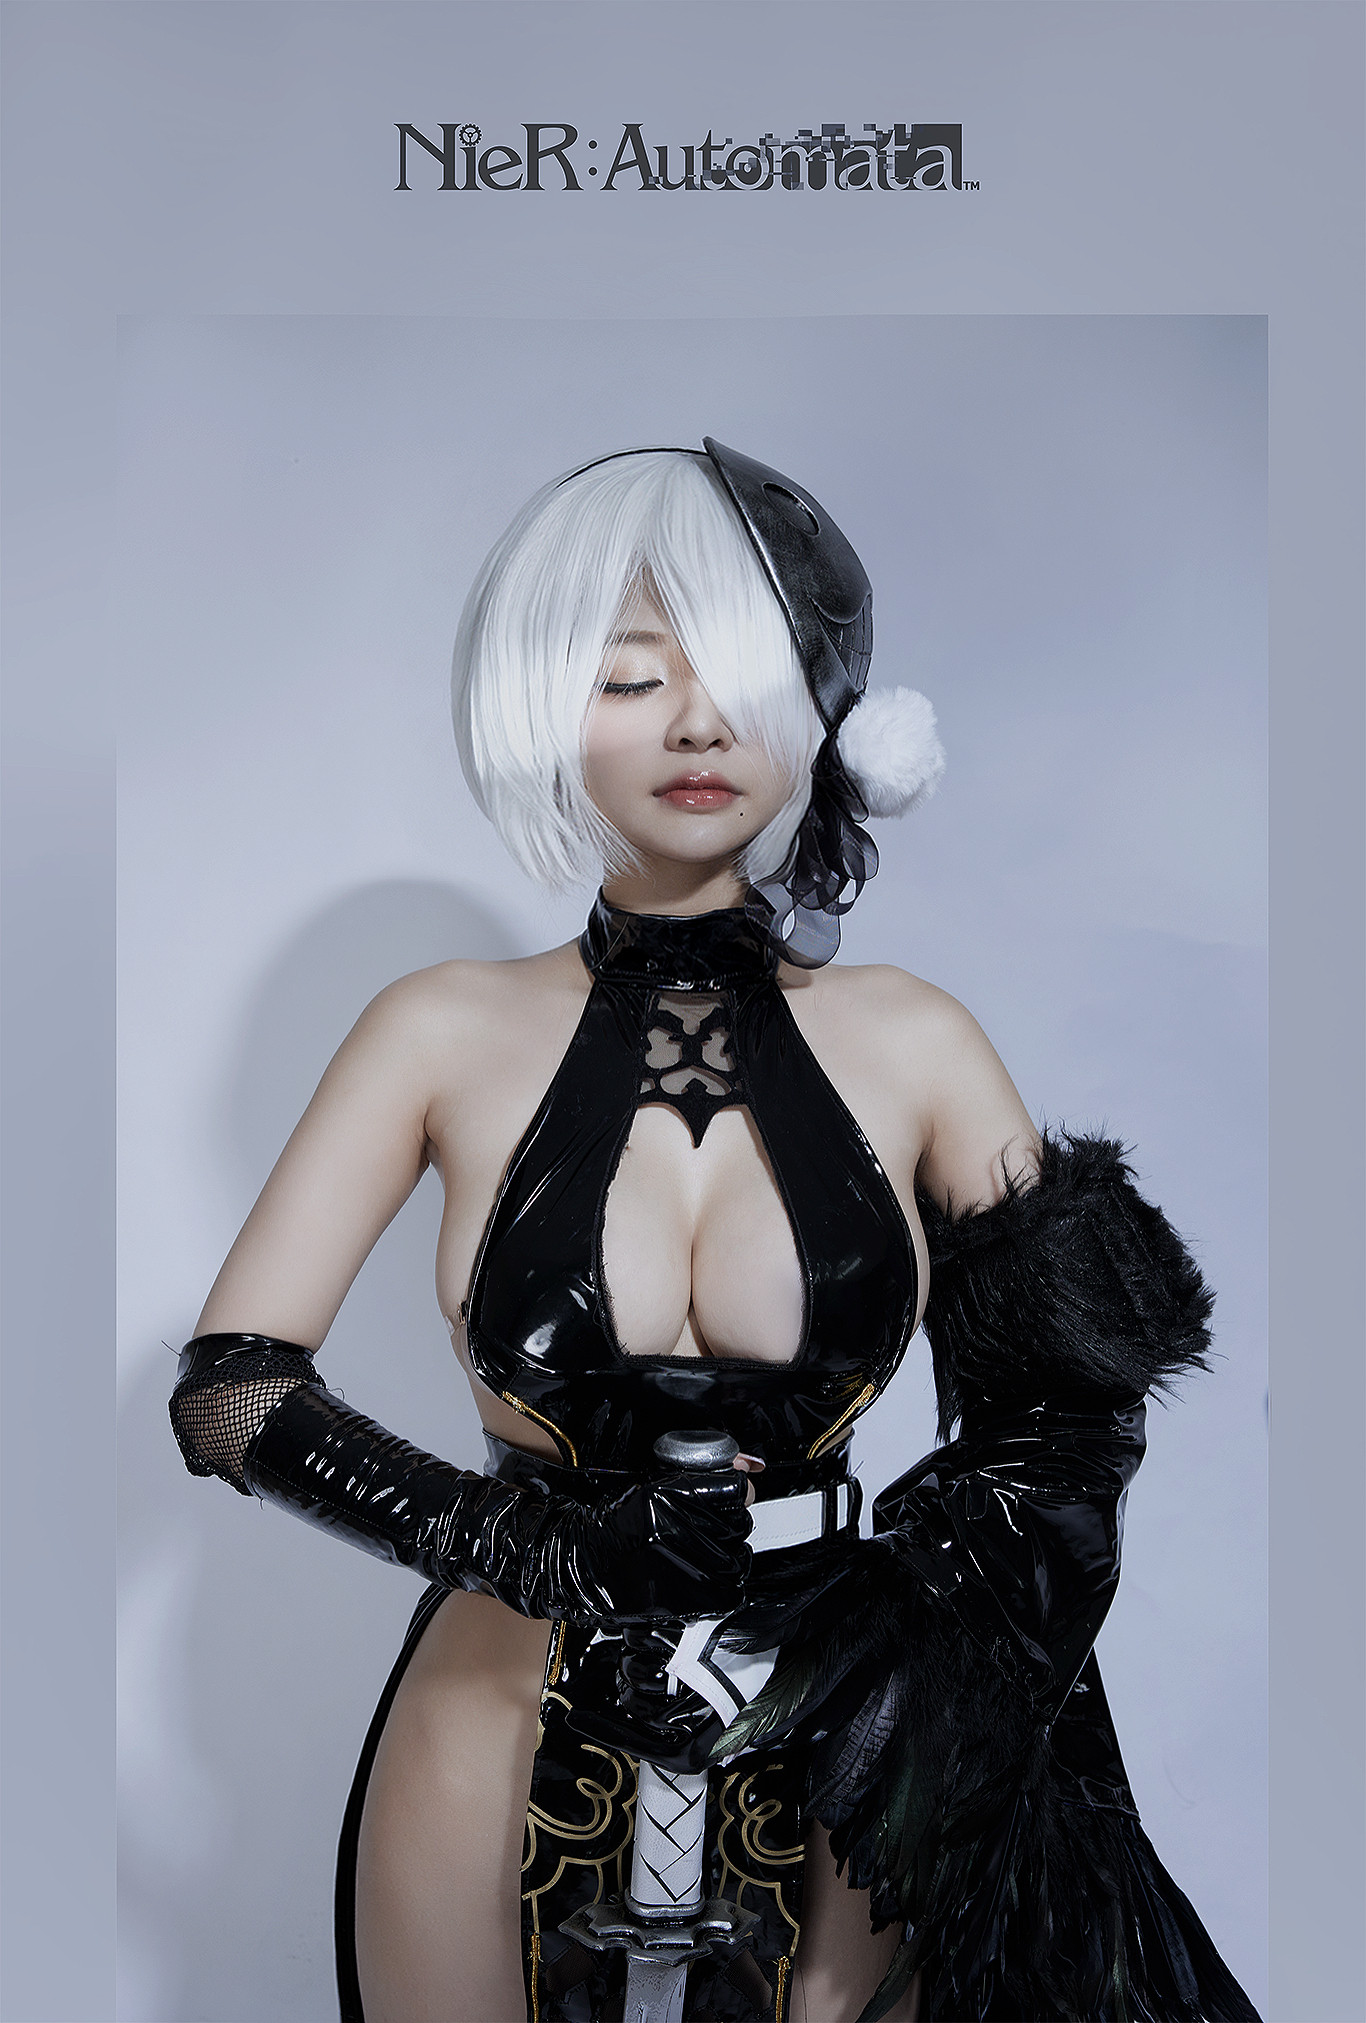 Azami - 2B Shinobi - Nier Automata Cosplay 01